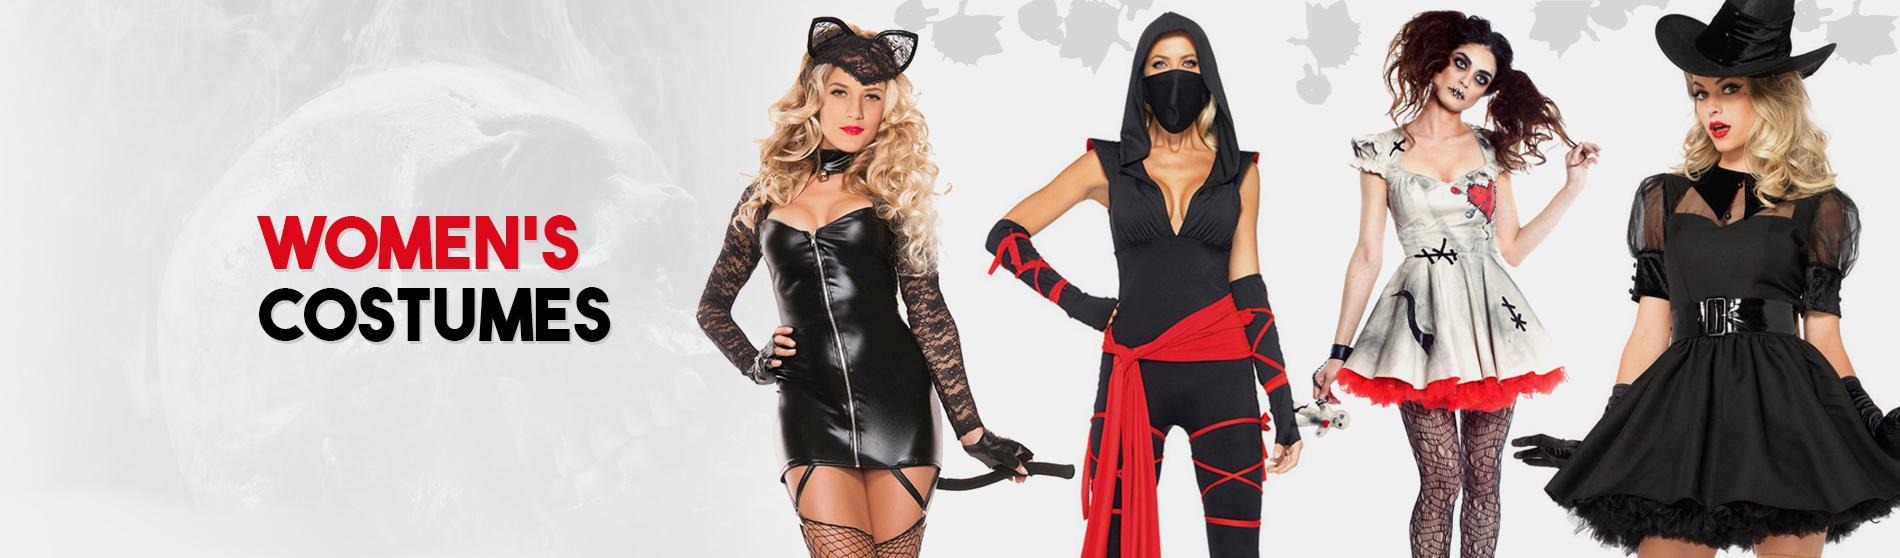 Glendale Halloween Store - Womens Costumes